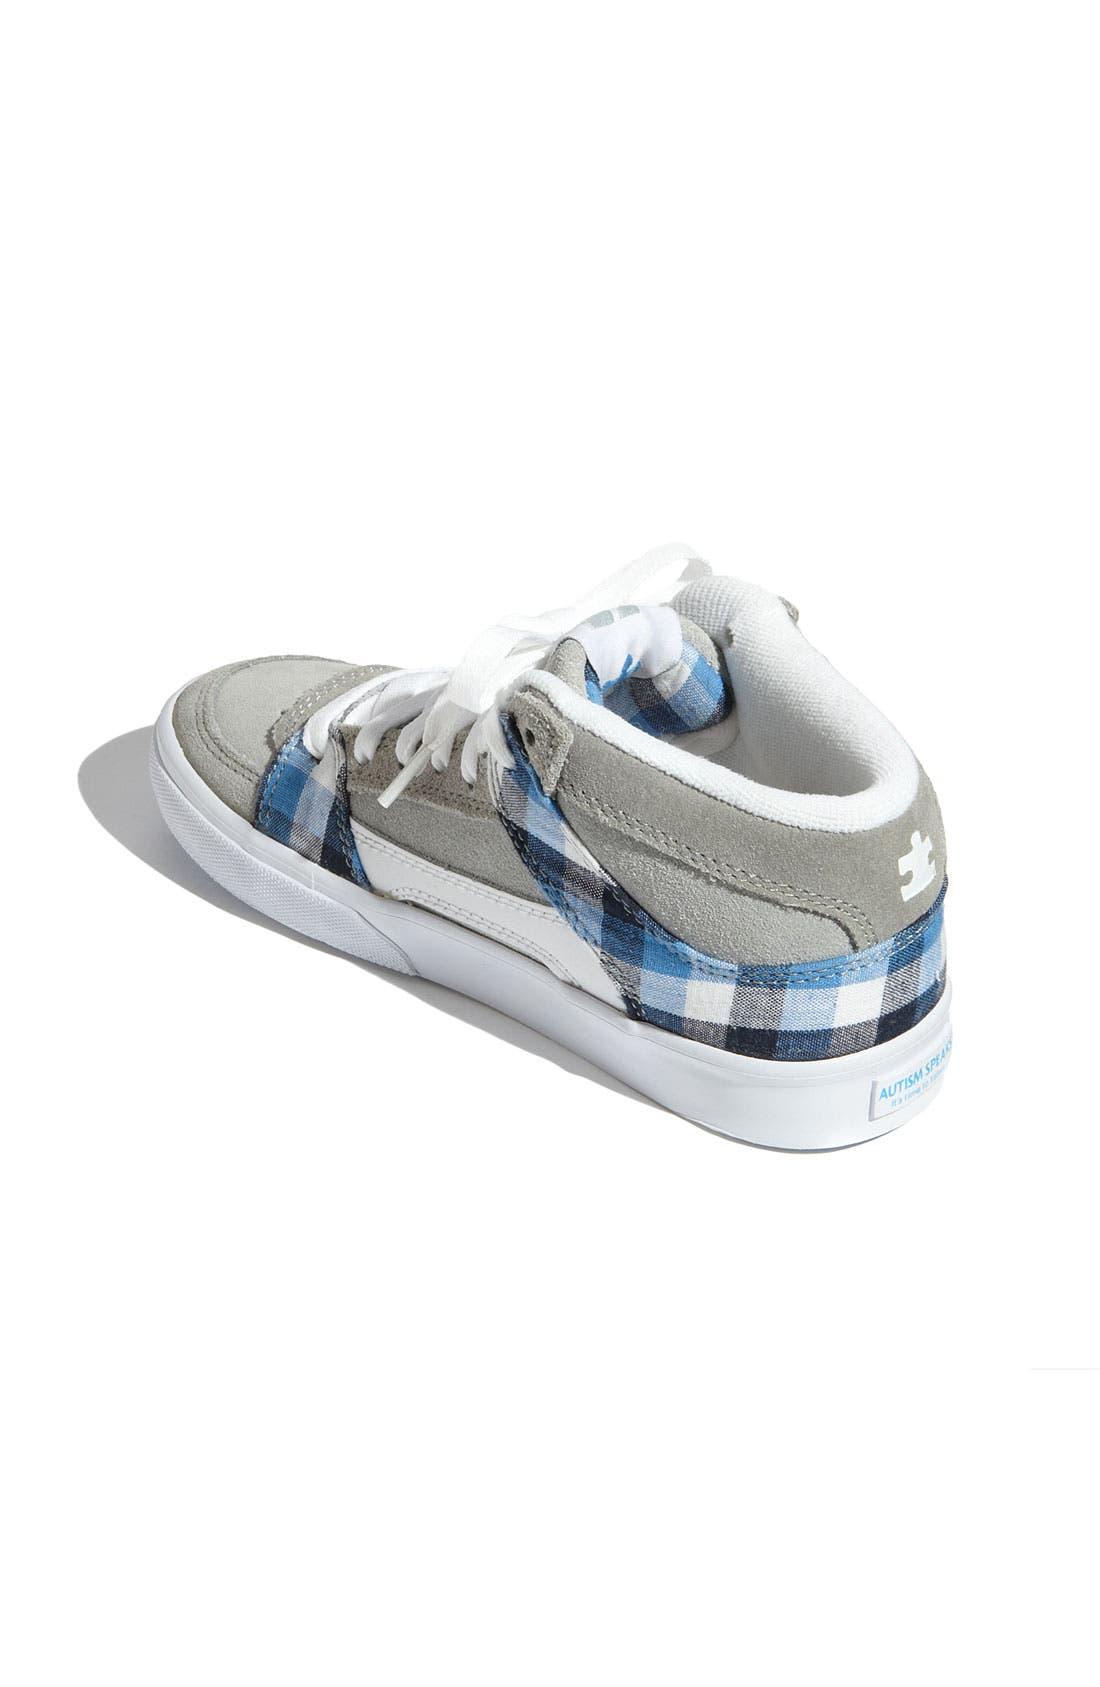 Alternate Image 2  - Etnies 'RVM - Autism Speaks' Skate Shoe (Toddler, Little Kid & Big Kid)